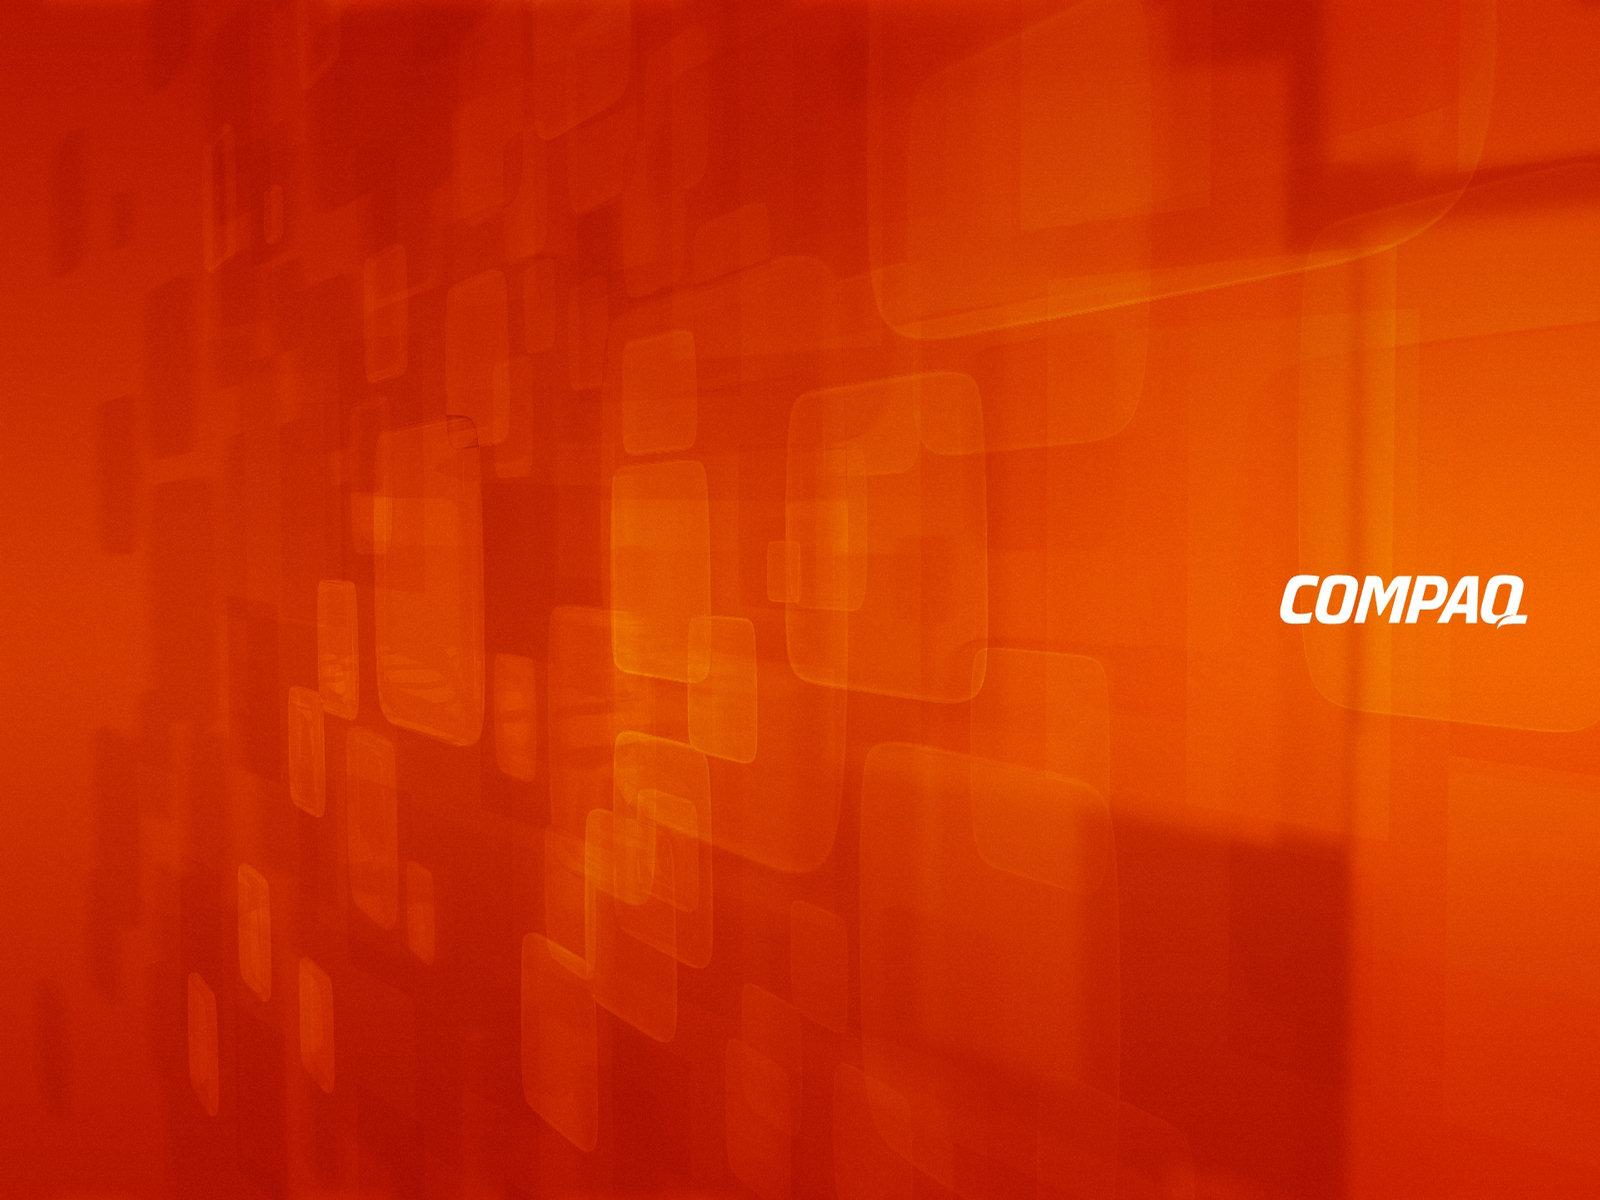 Compaq Red Orange Wallpaper Geekpedia 1600x1200